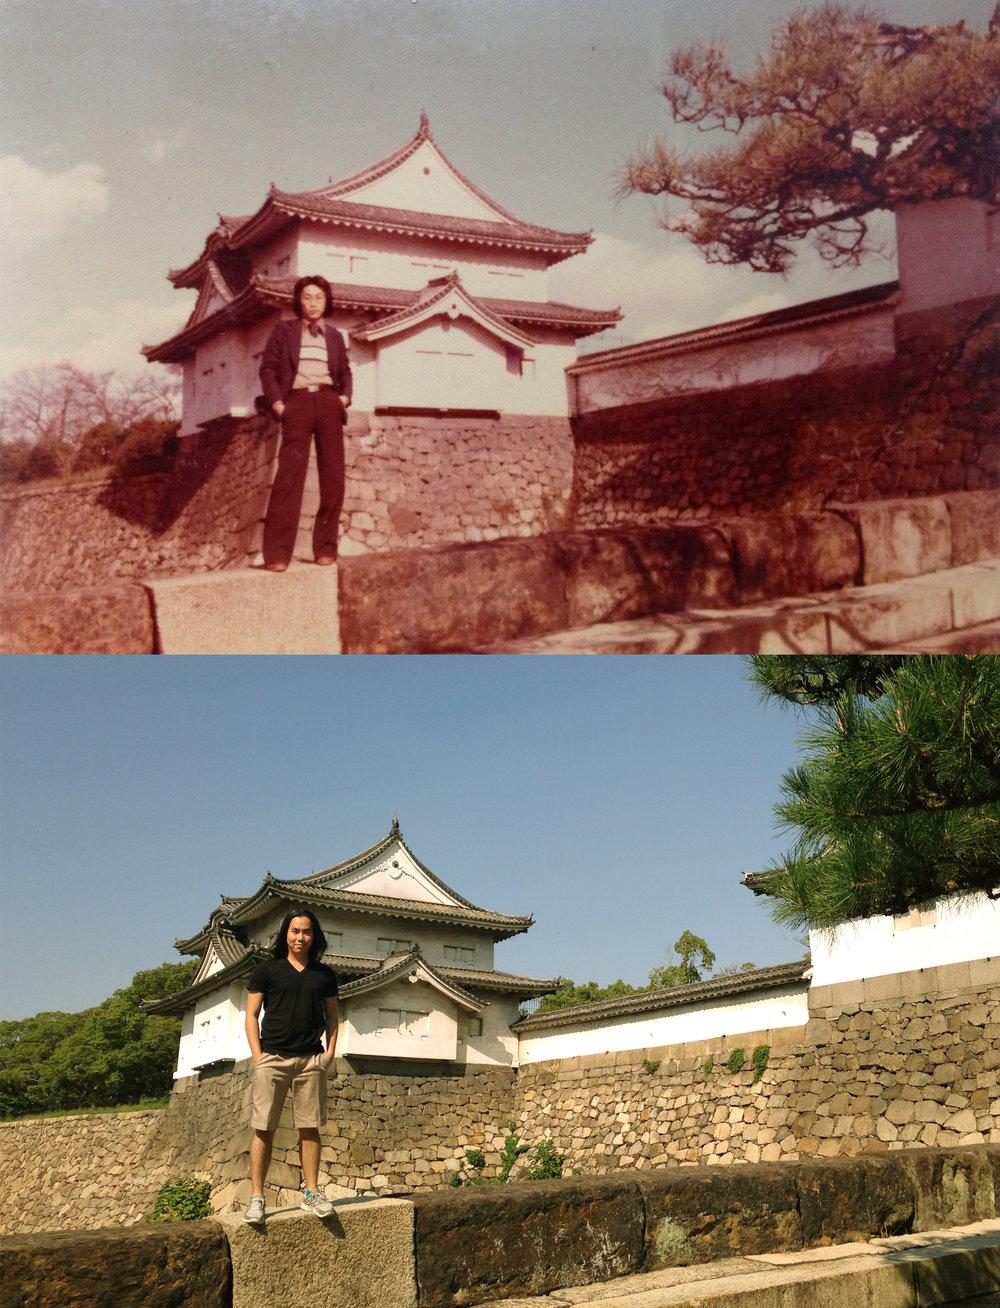 Above: Dad,1979. Below: Me, 2013 at Osaka Castle.